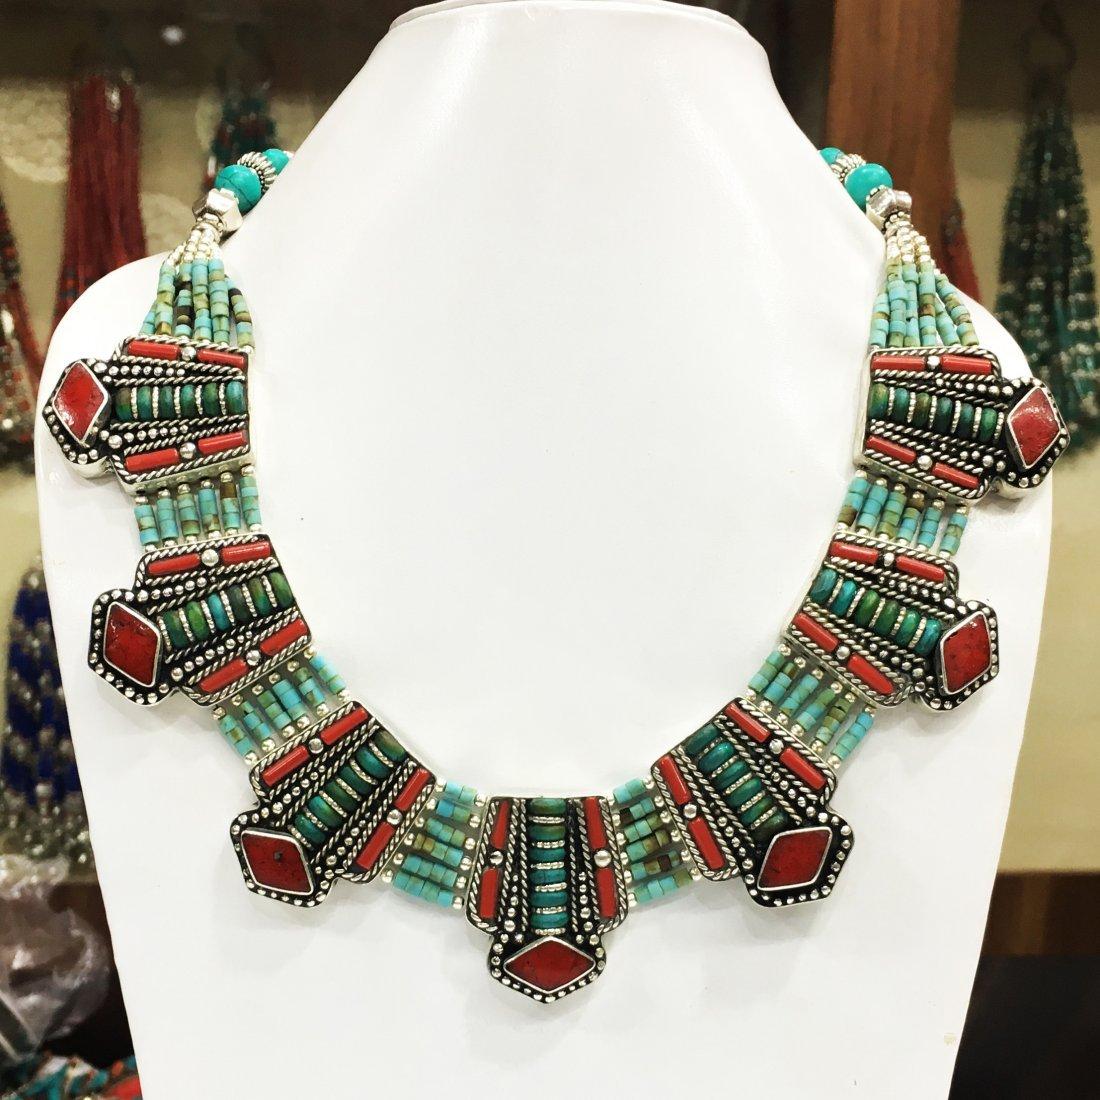 Tibetan Turquoise Beads Handmade Statement Necklace